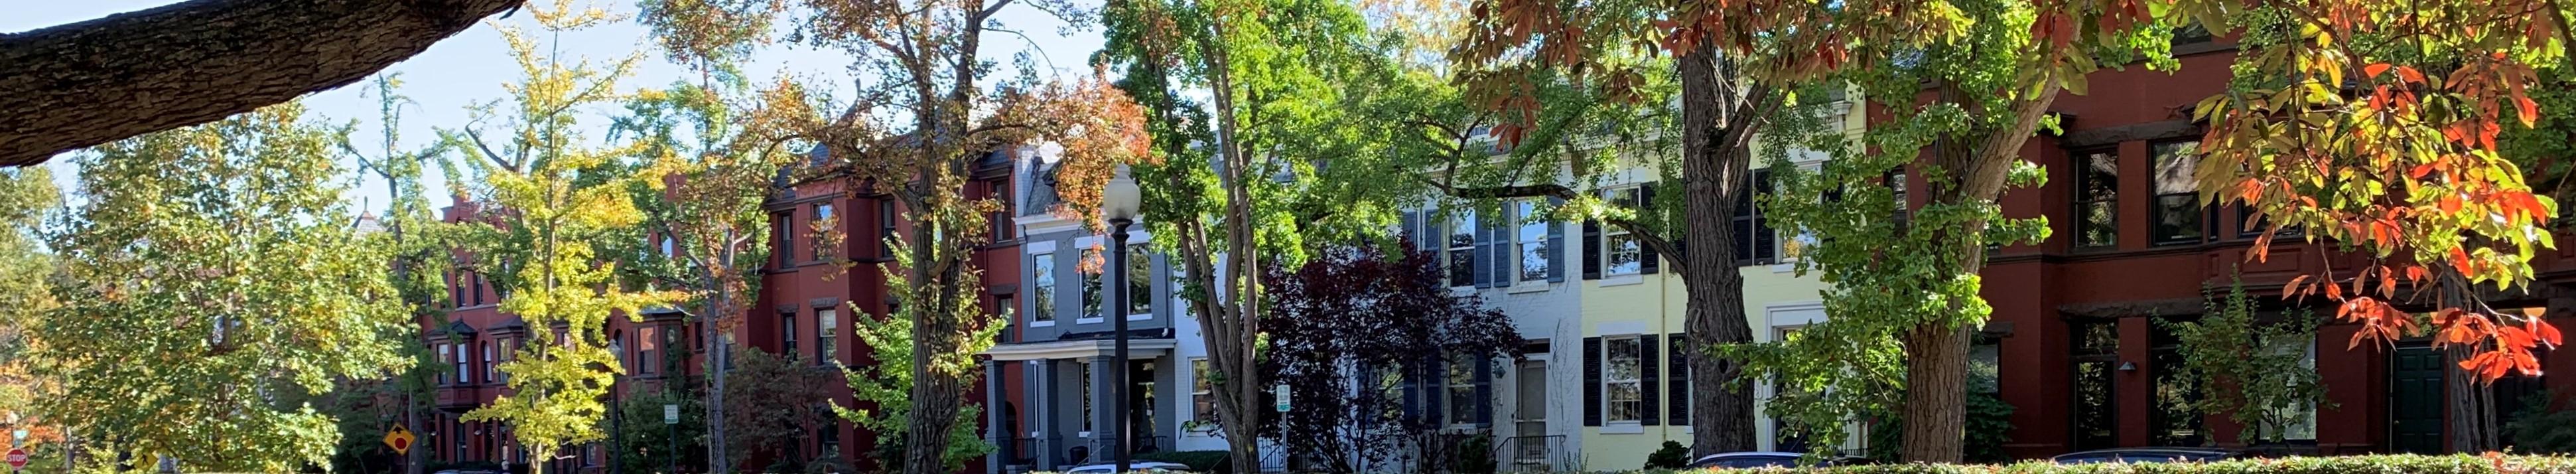 Washington, DC Luxury Homes For Sale. Near Montrose Park in Georgetown. Artyom Shmatko Realtor